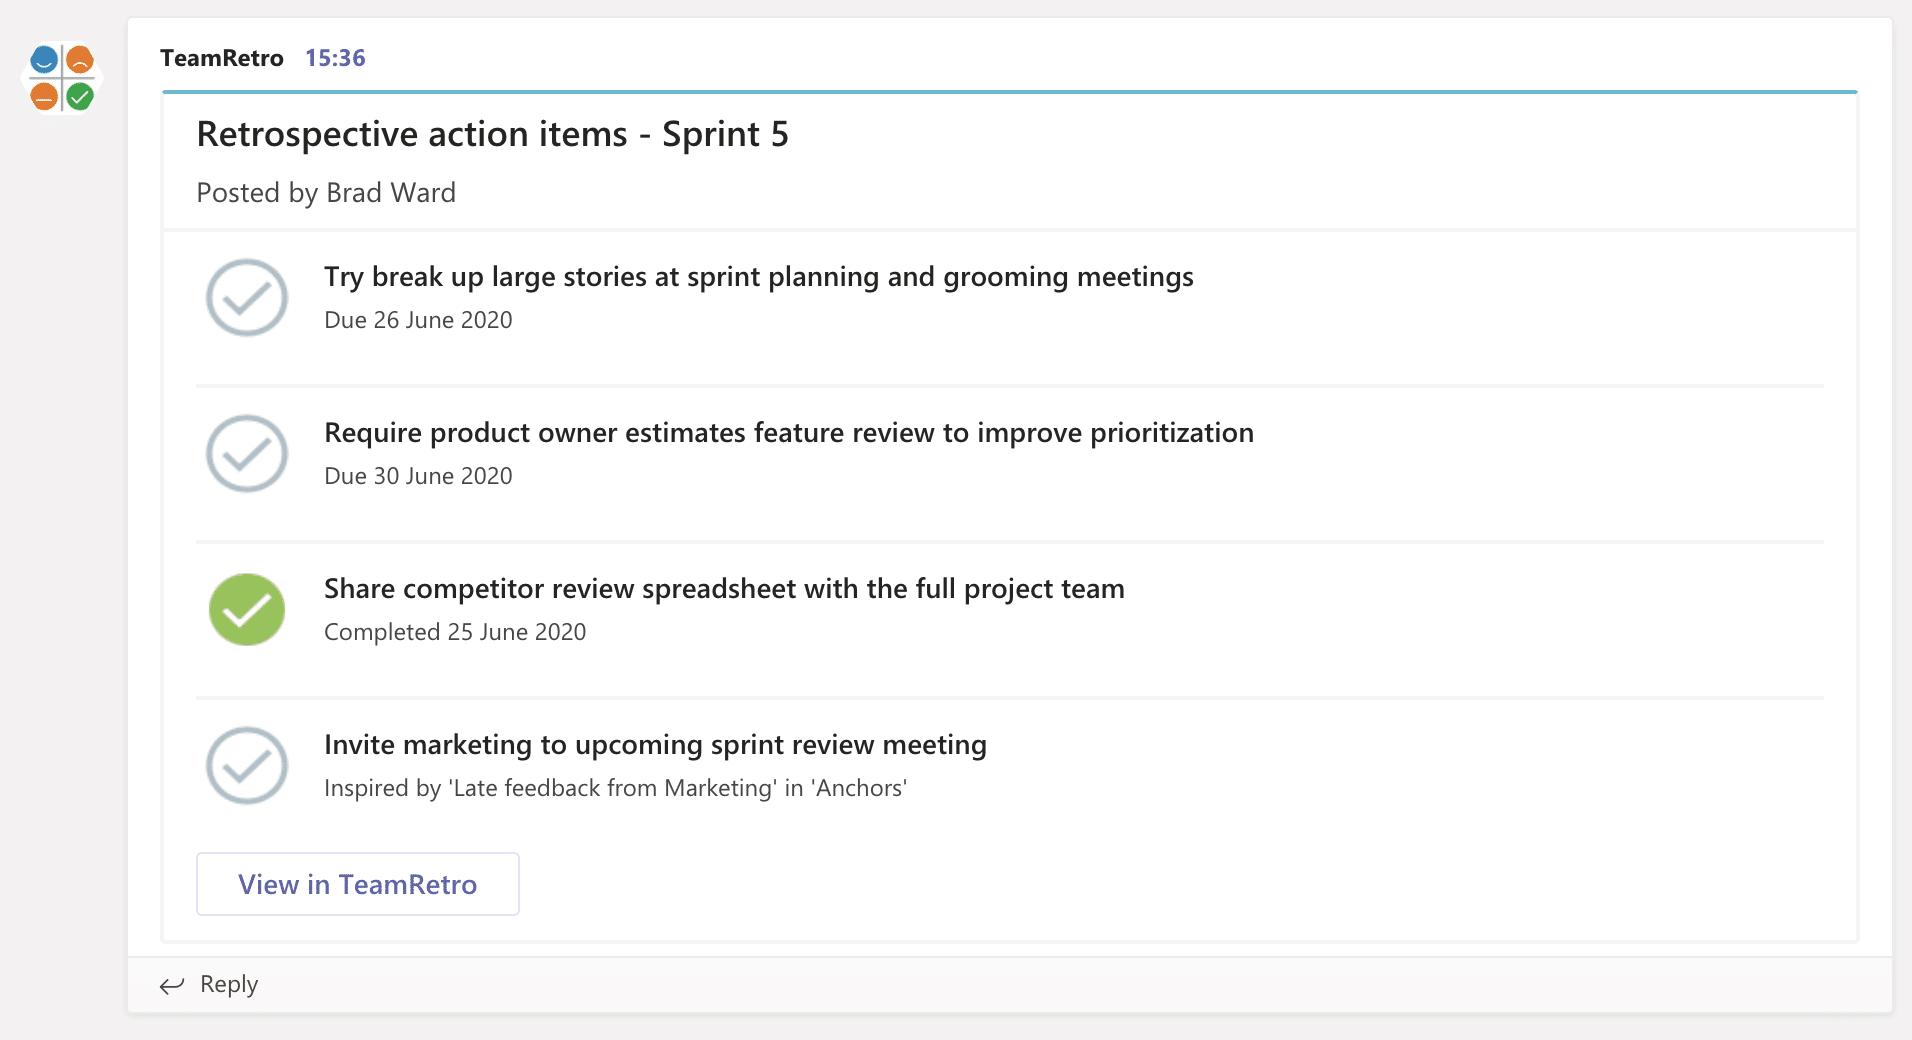 Microsoft Teams Retrospective Action Items